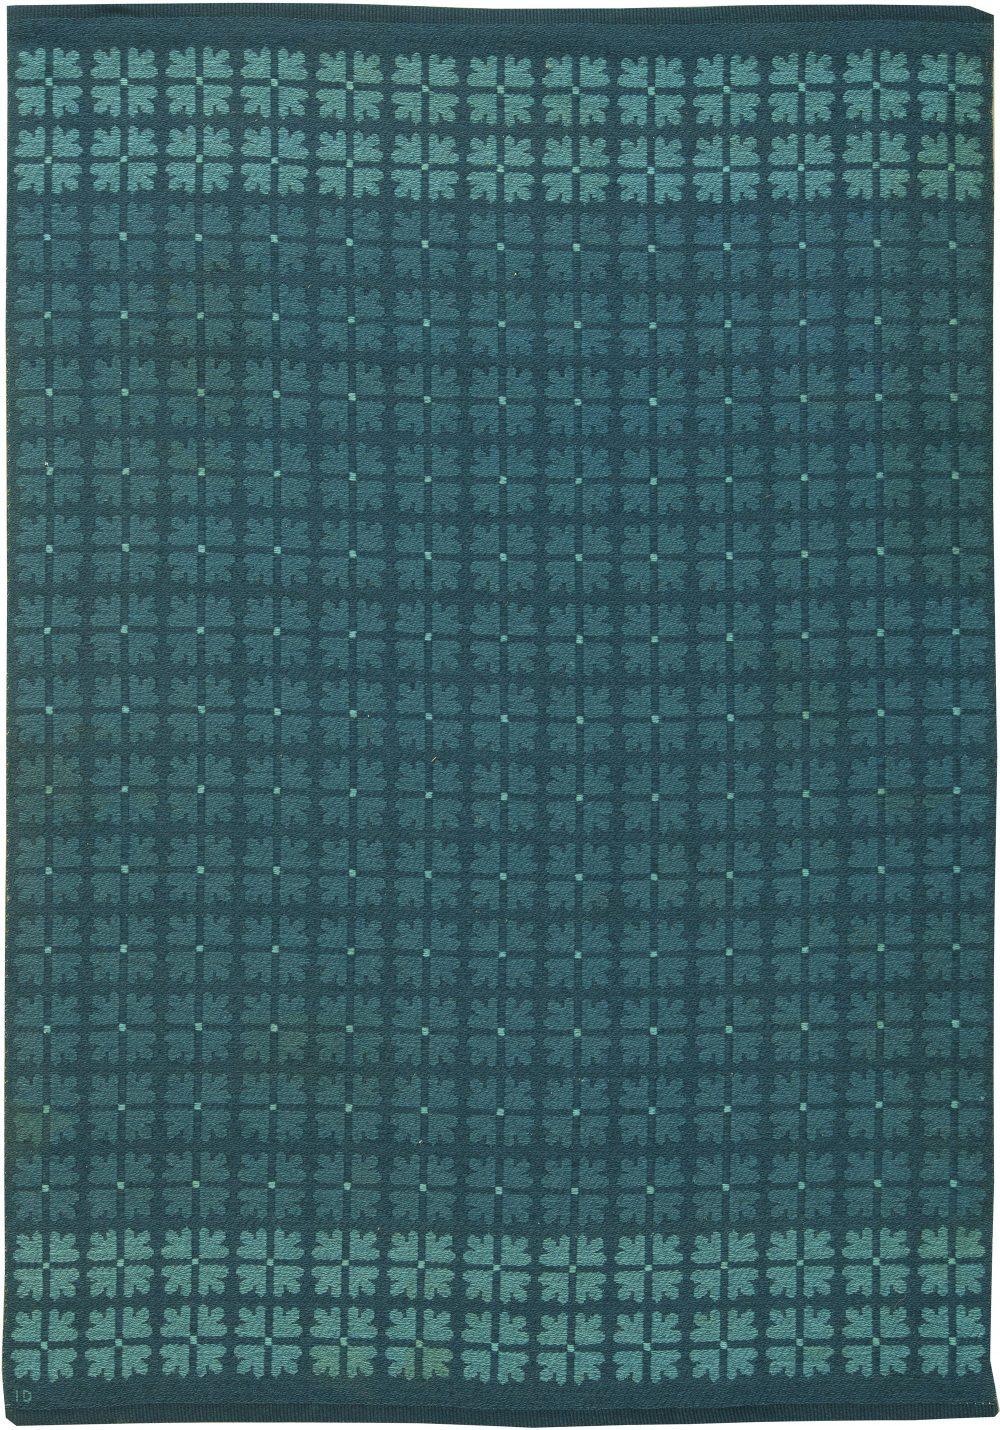 Vintage Swedish Flat Weave Reversible Rug by Ingrid Dessau BB6154